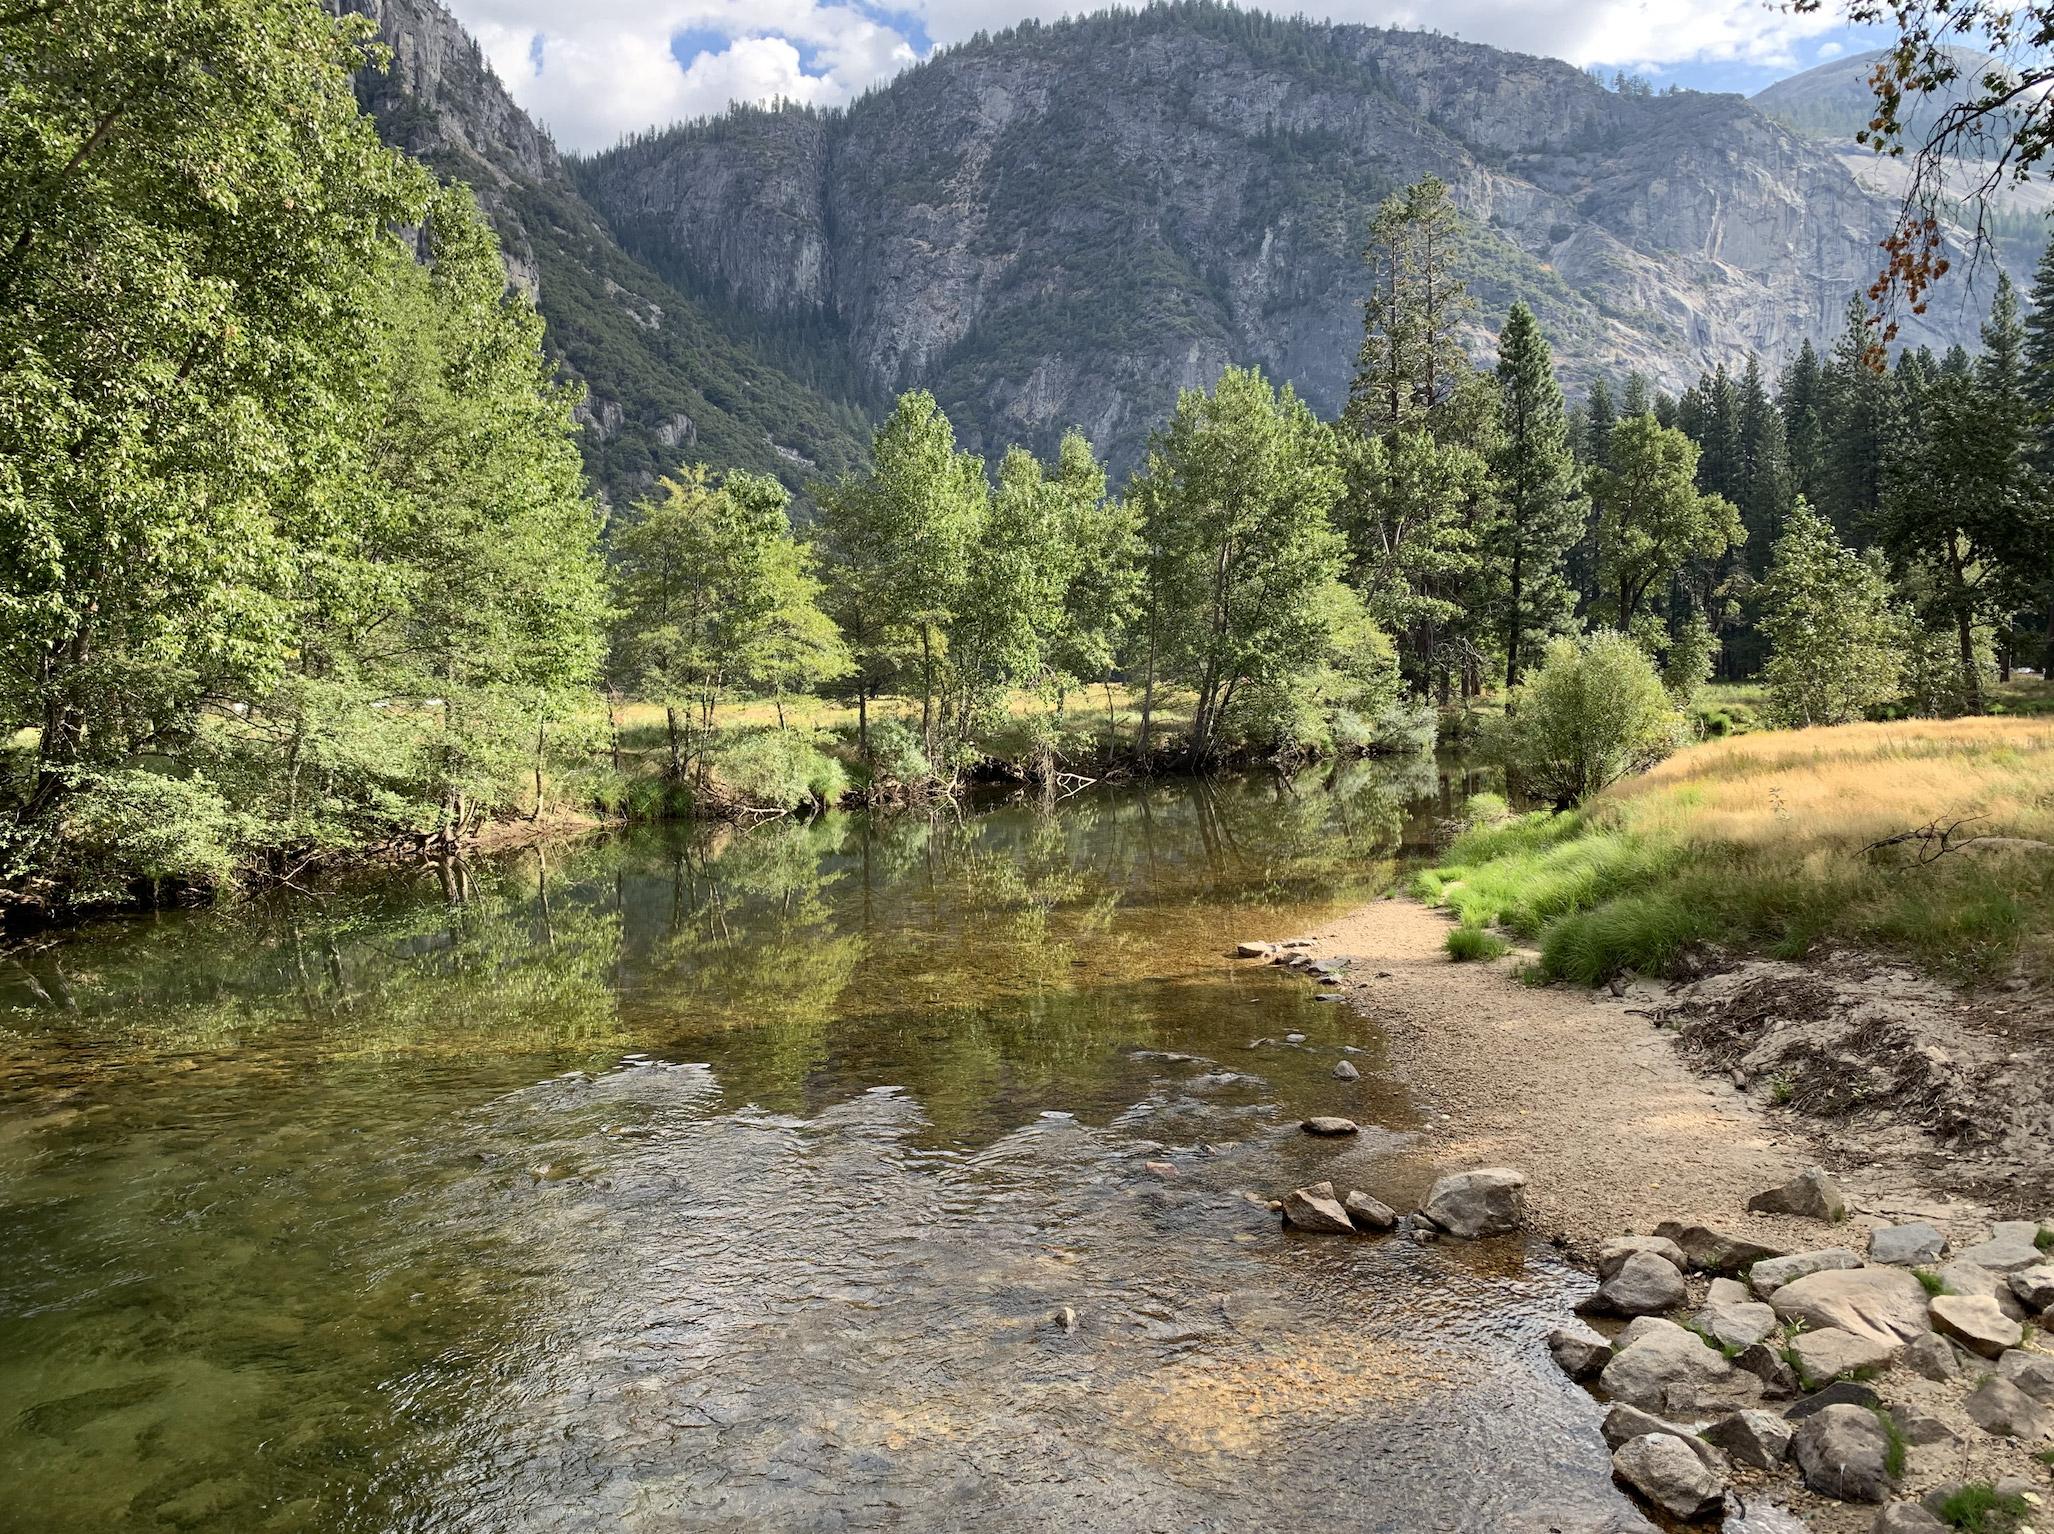 High Sierra Camps - July 2020